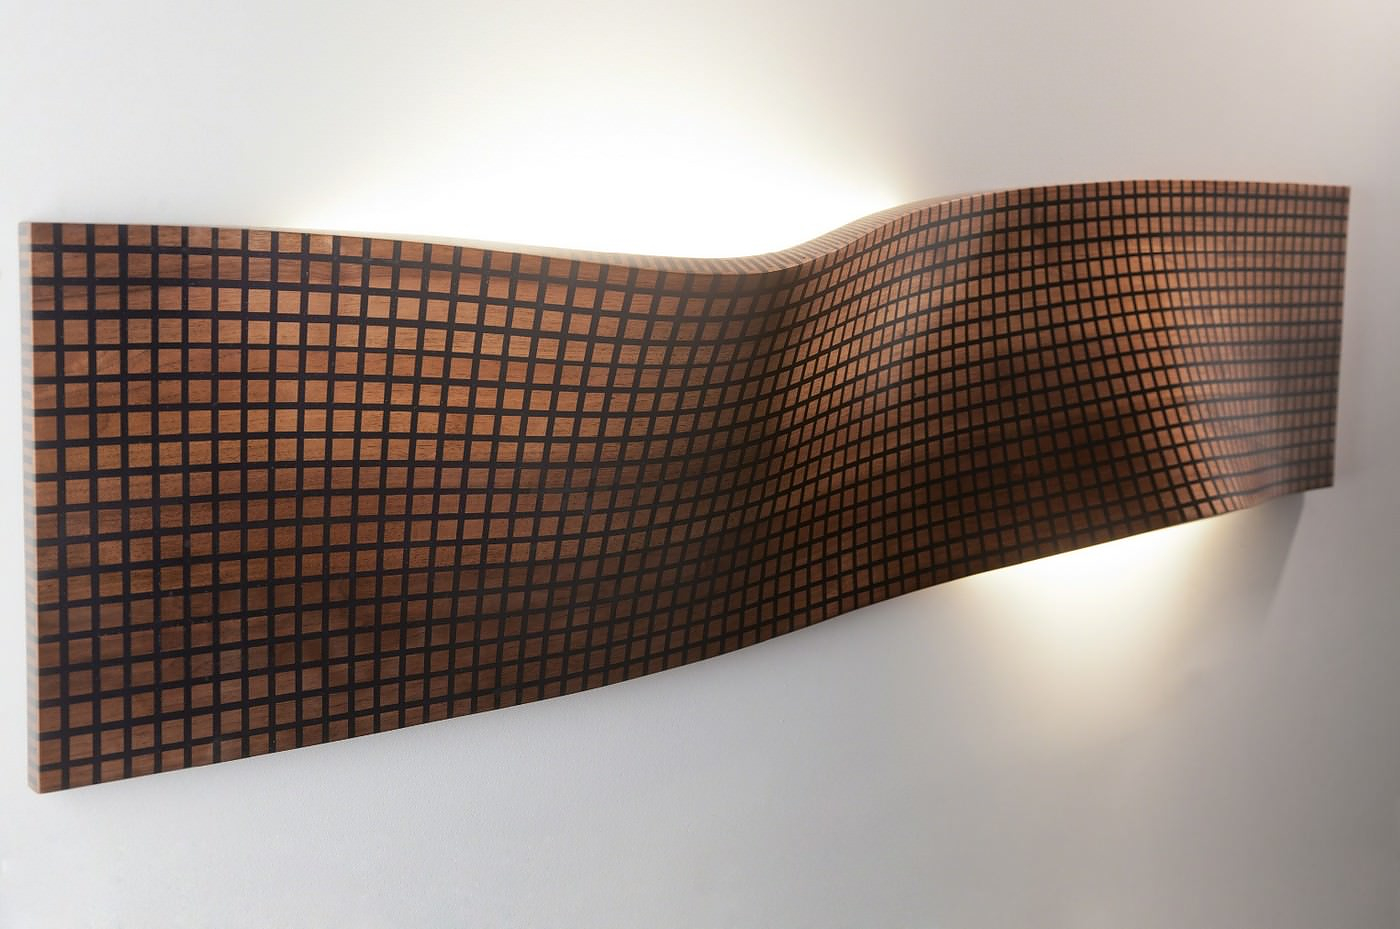 Grid Series Sculptural Wooden Lamps by Maarten De Ceulaer.